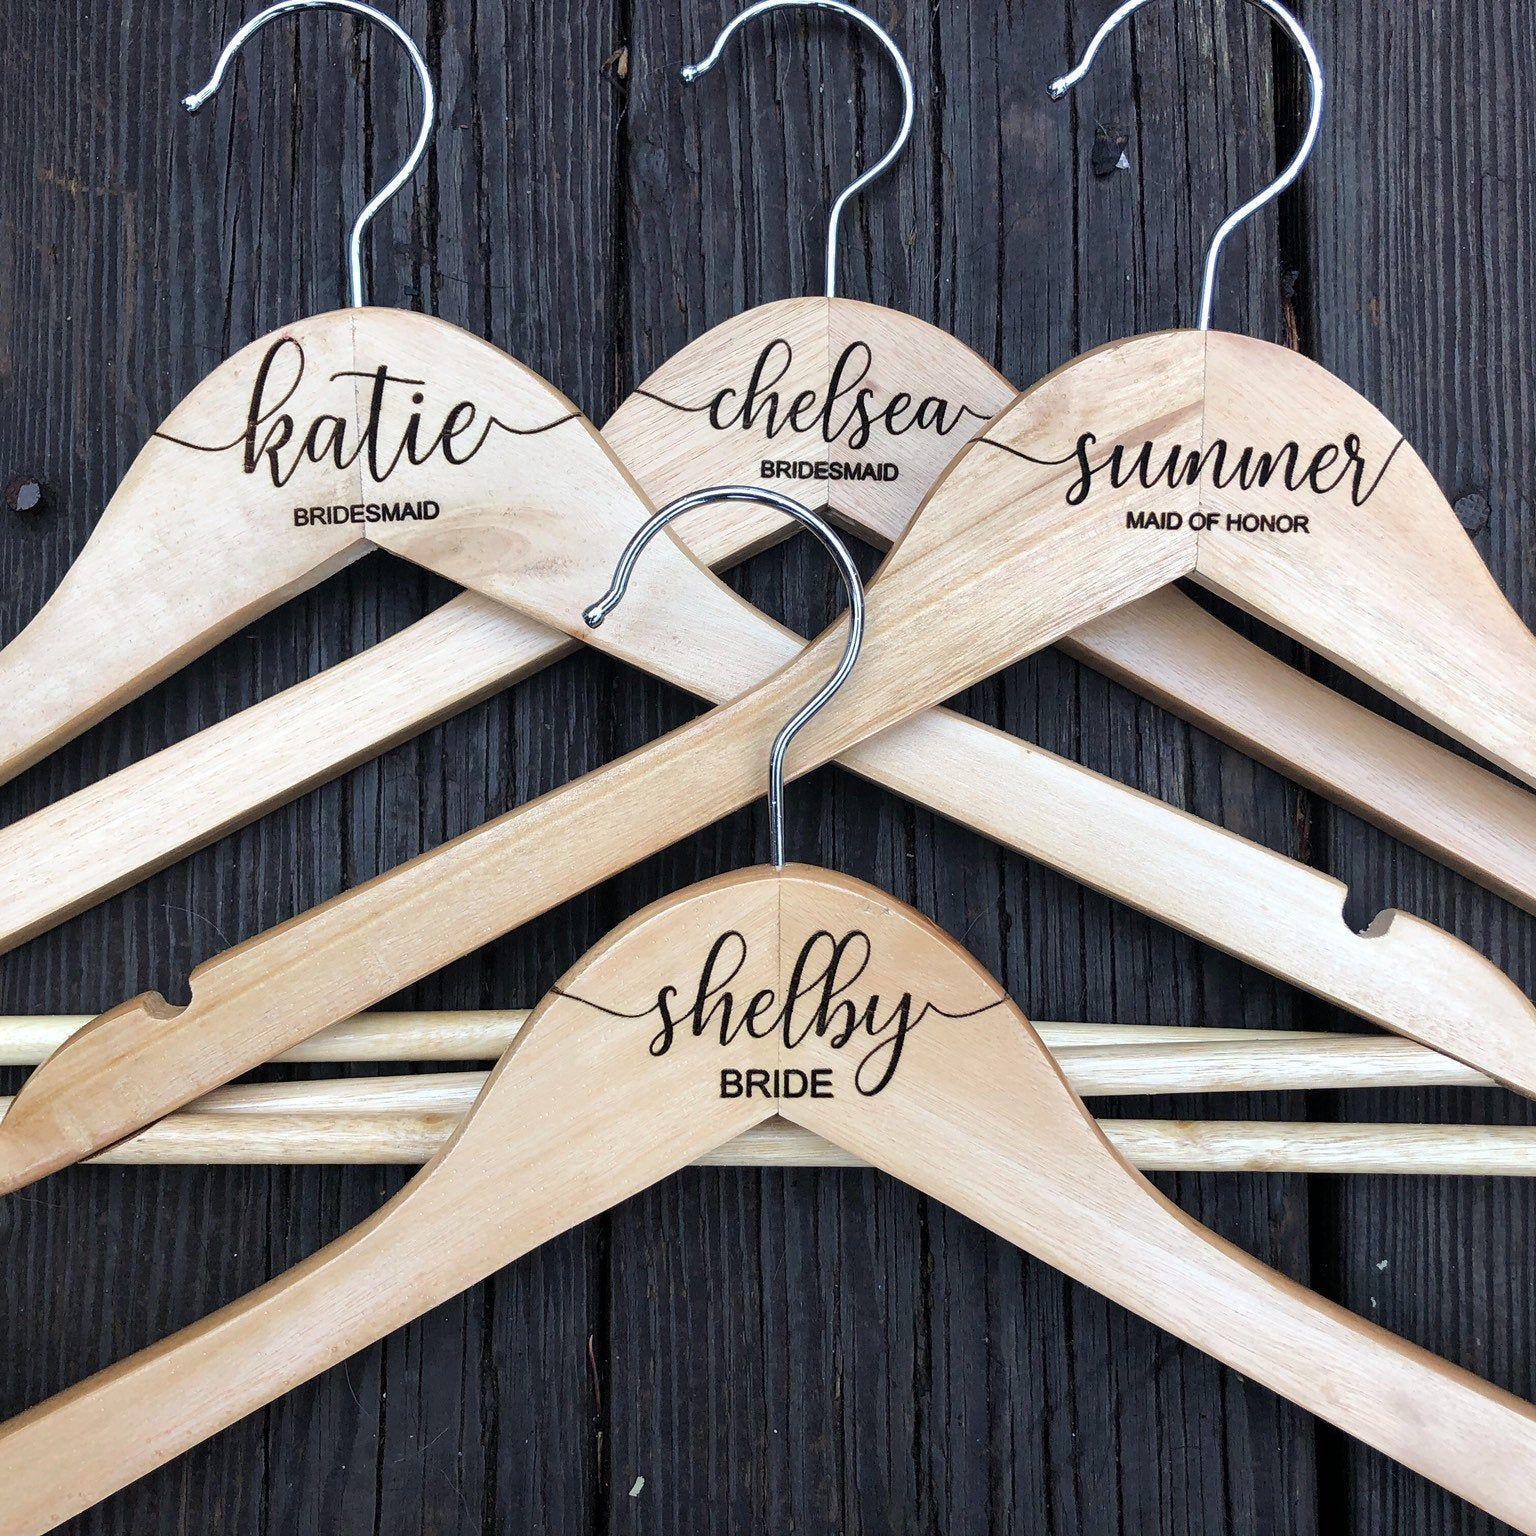 Wedding Dress Hangers Personalized Hangers Bridesmaid Hangers Bridal Gift Bridesmaids Gifts Wedding Gift Personalized Wedding Hanger